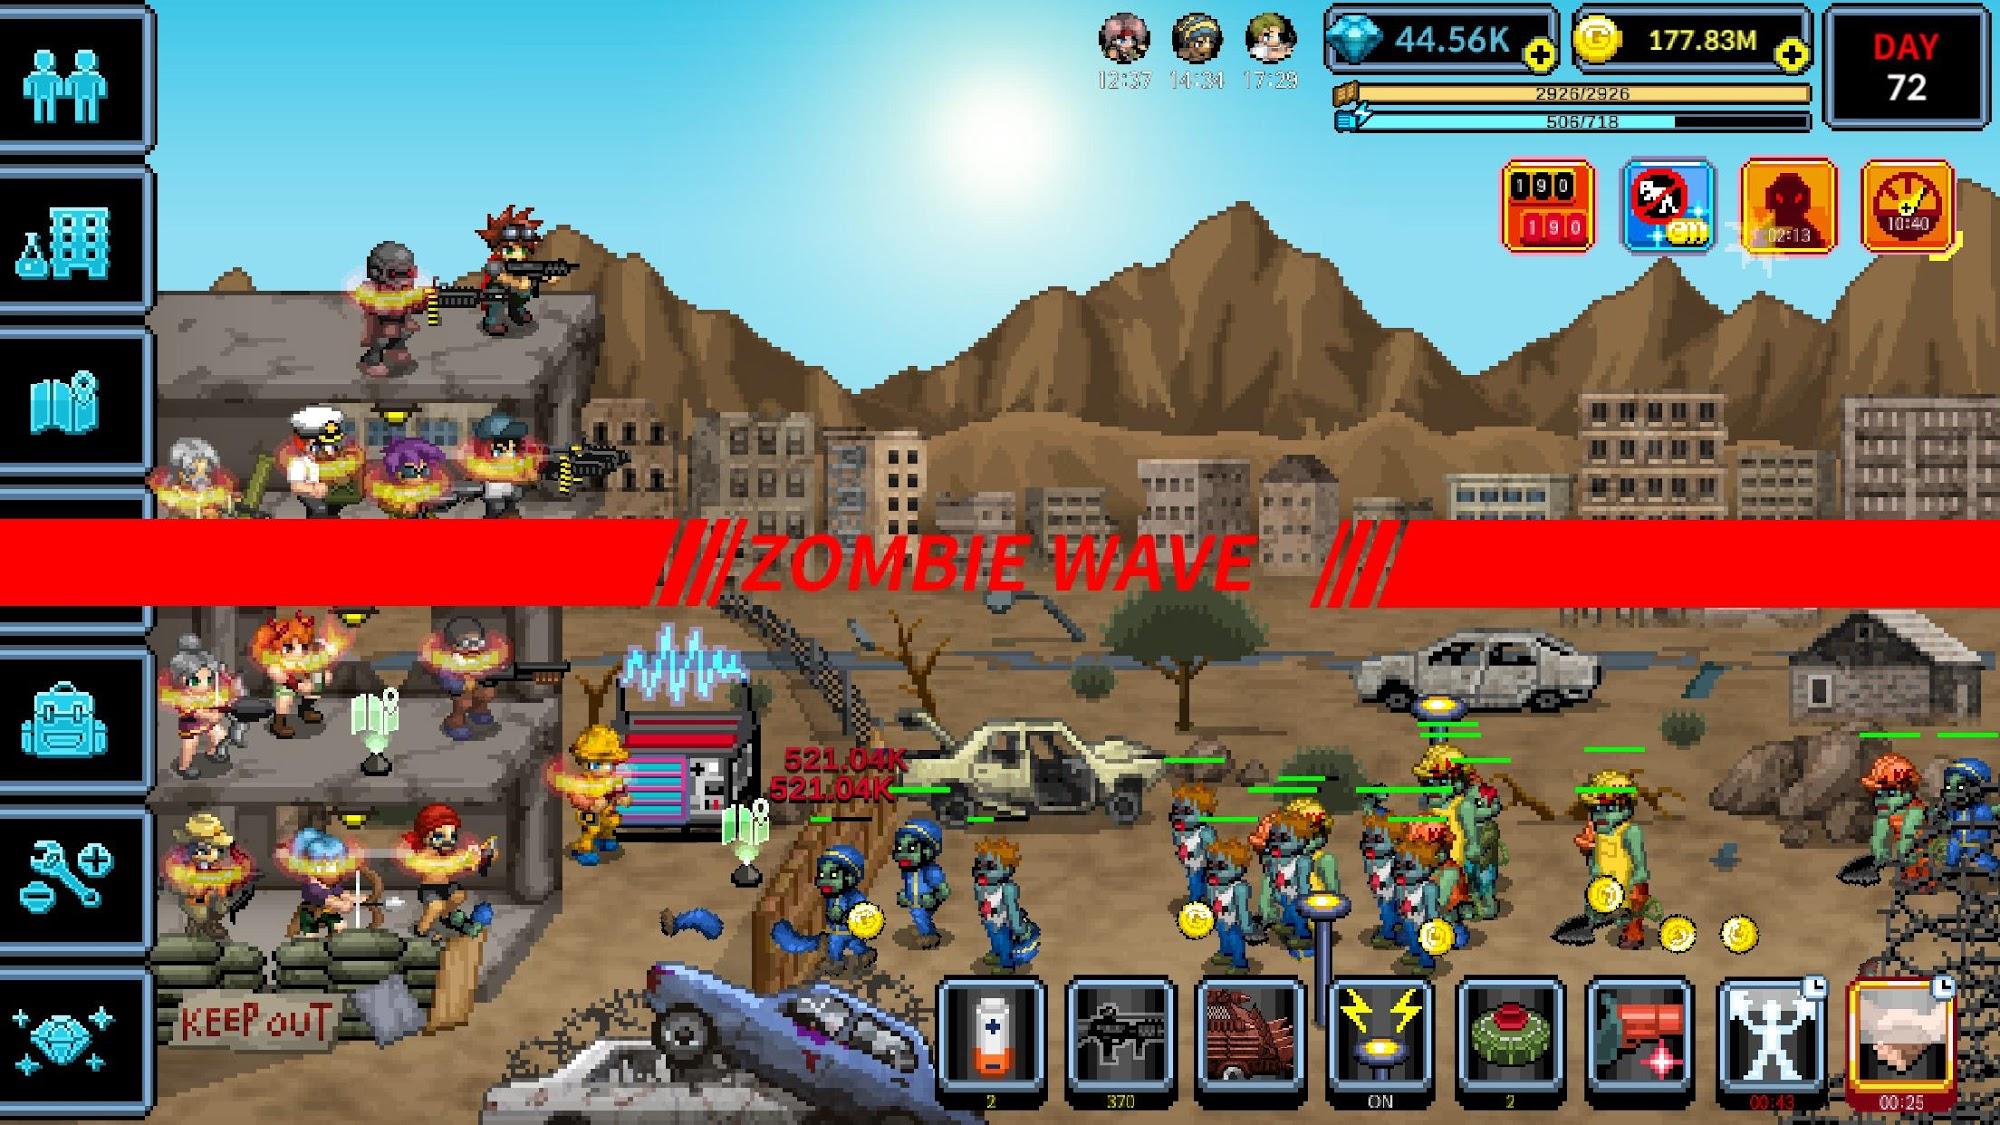 200 DAYS Zombie Apocalypse captura de tela 1